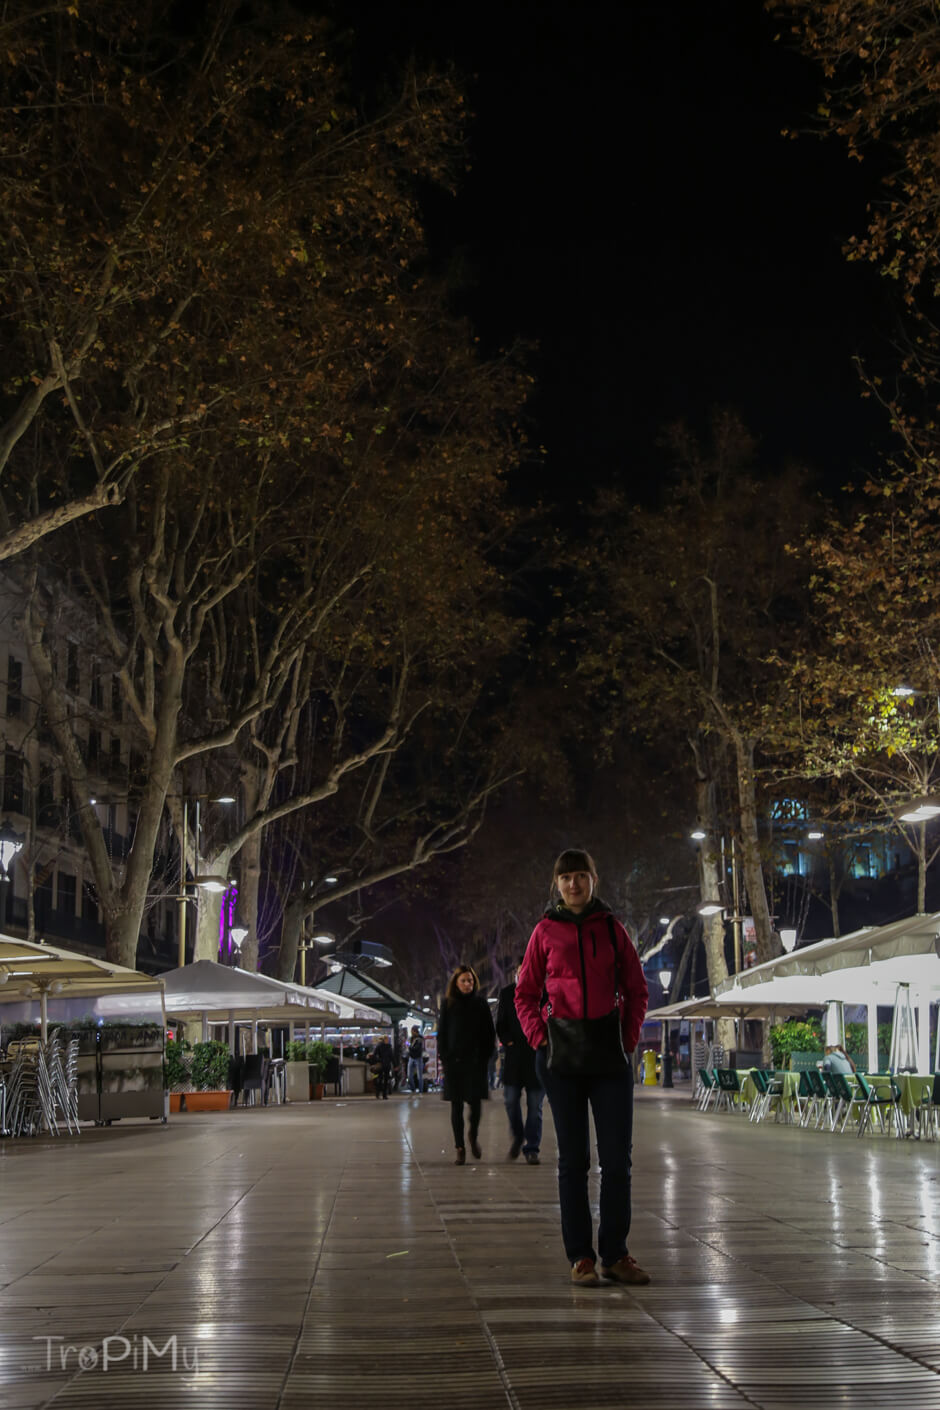 Barcelona, La Rambla by night